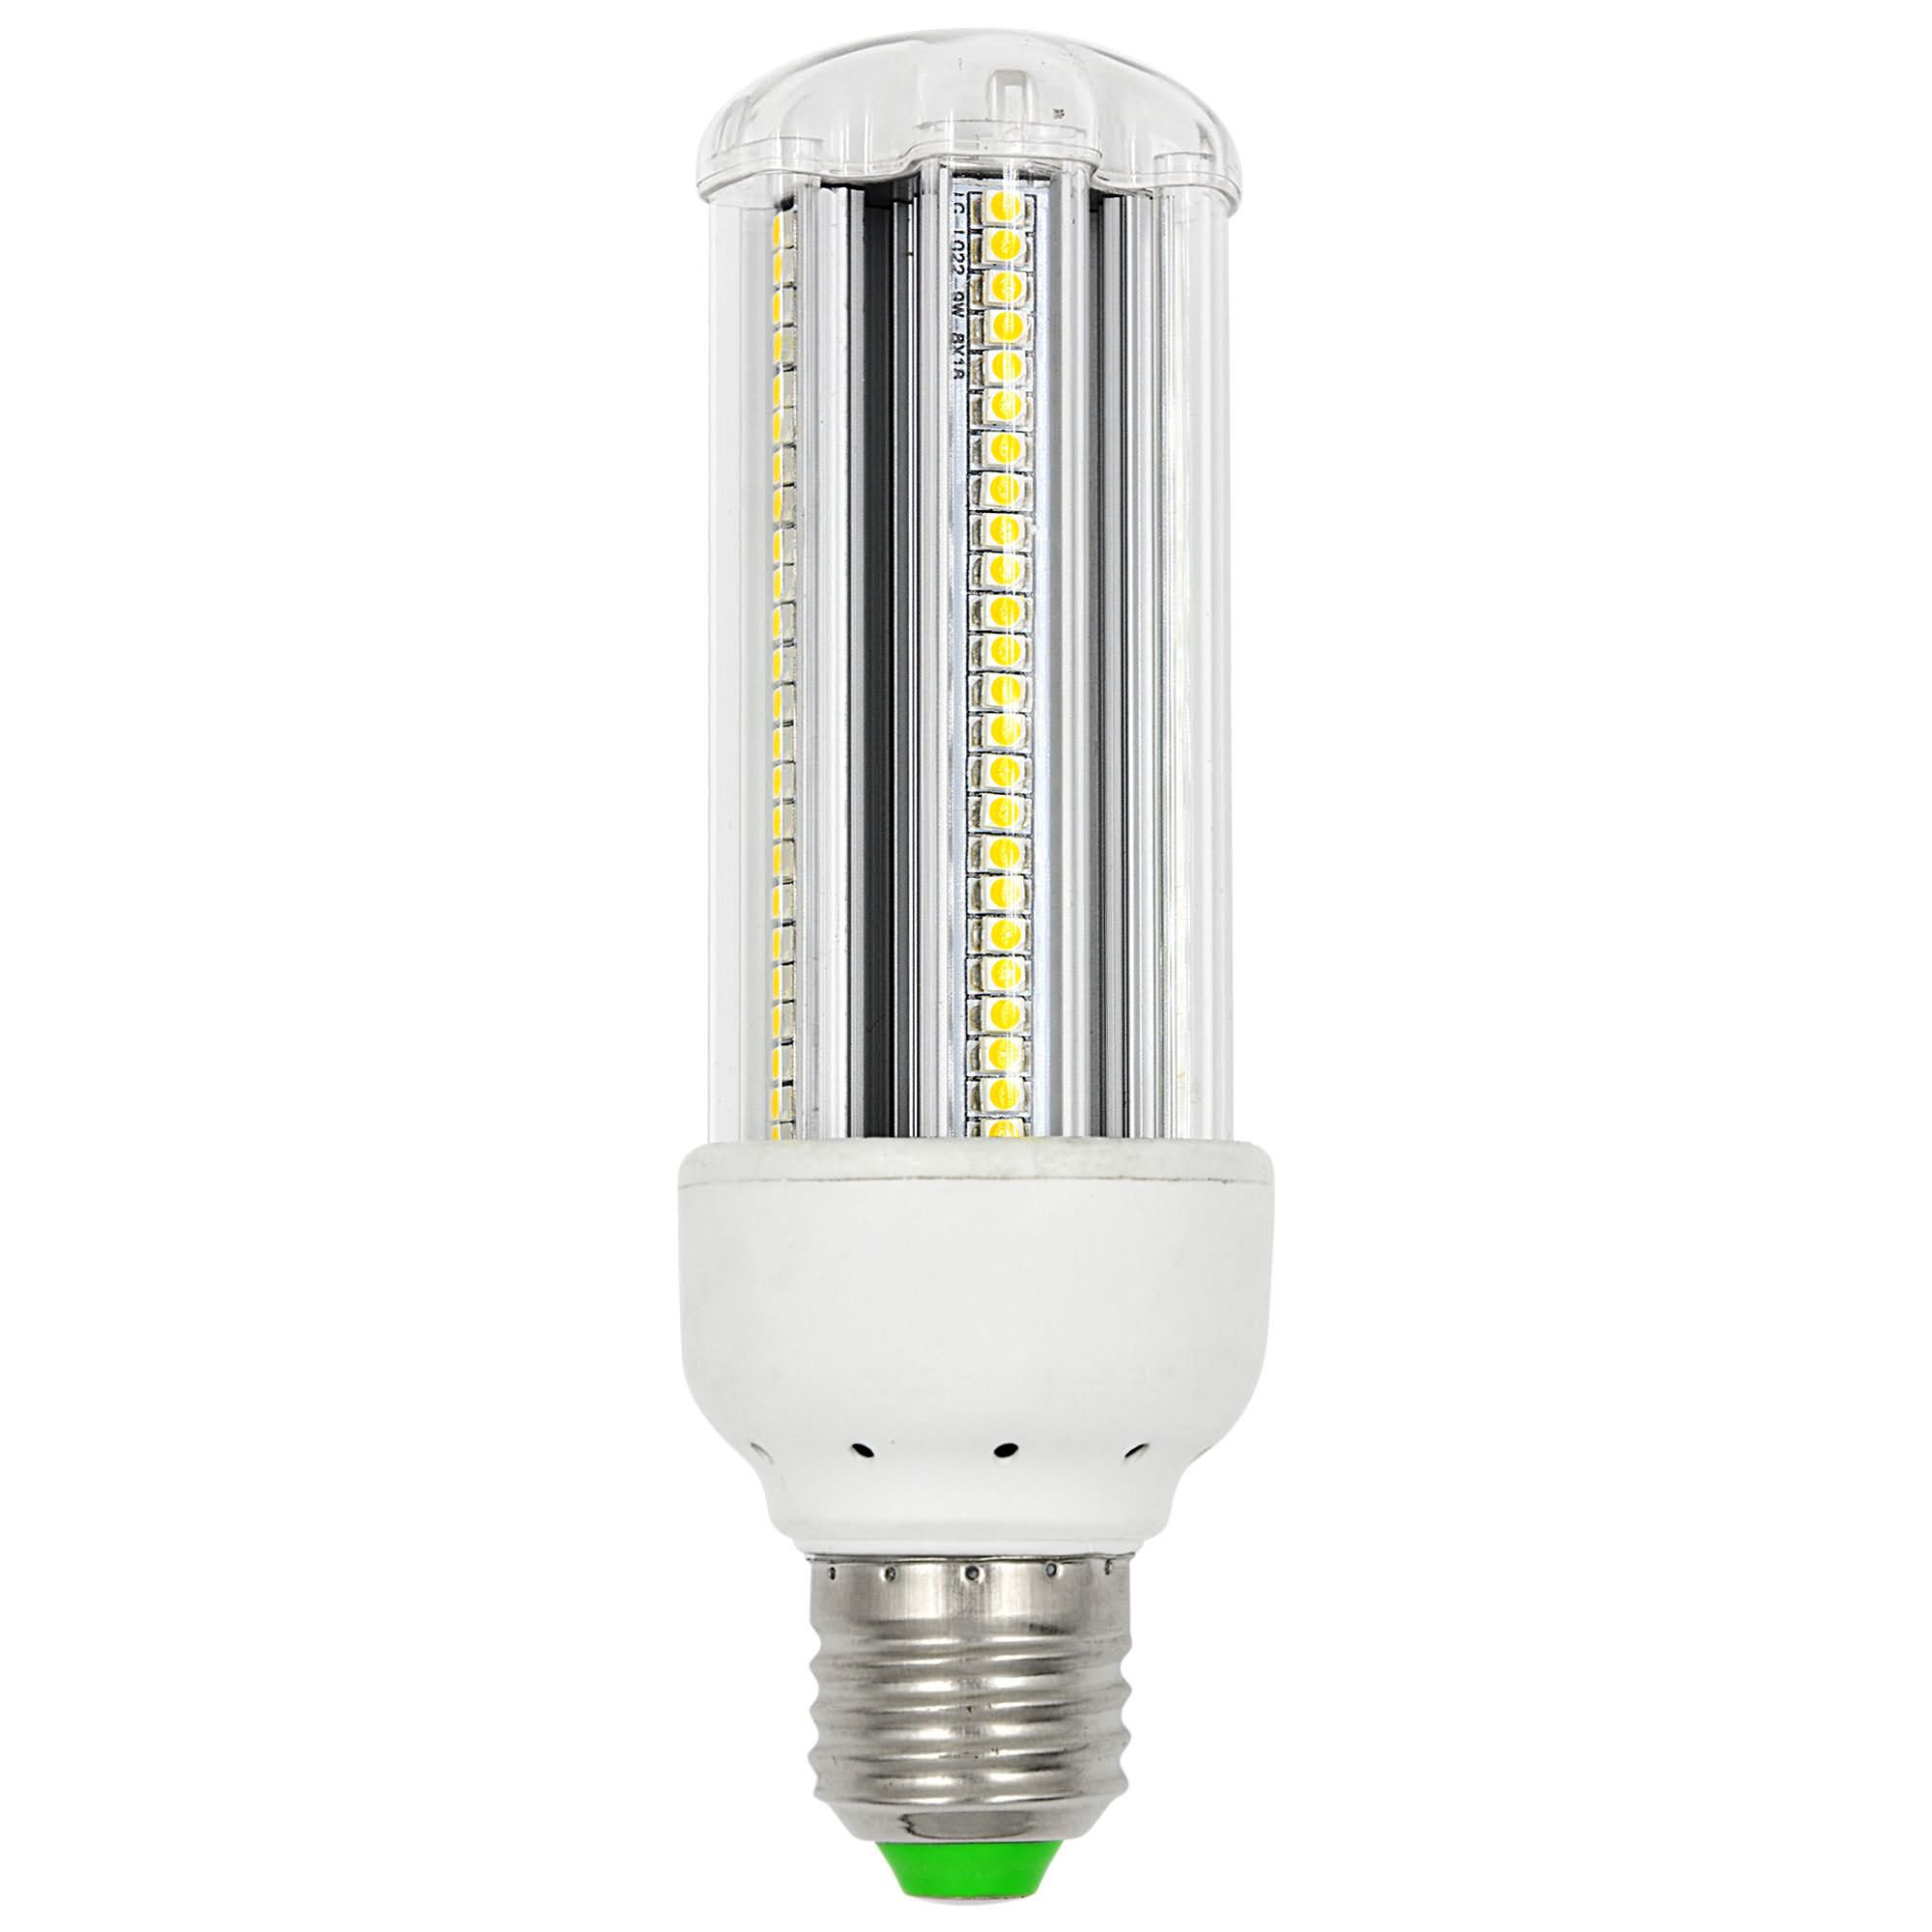 e27 9w led corn light 144x 3528 smd leds led bulb in cool white energy saving lamp led lights. Black Bedroom Furniture Sets. Home Design Ideas